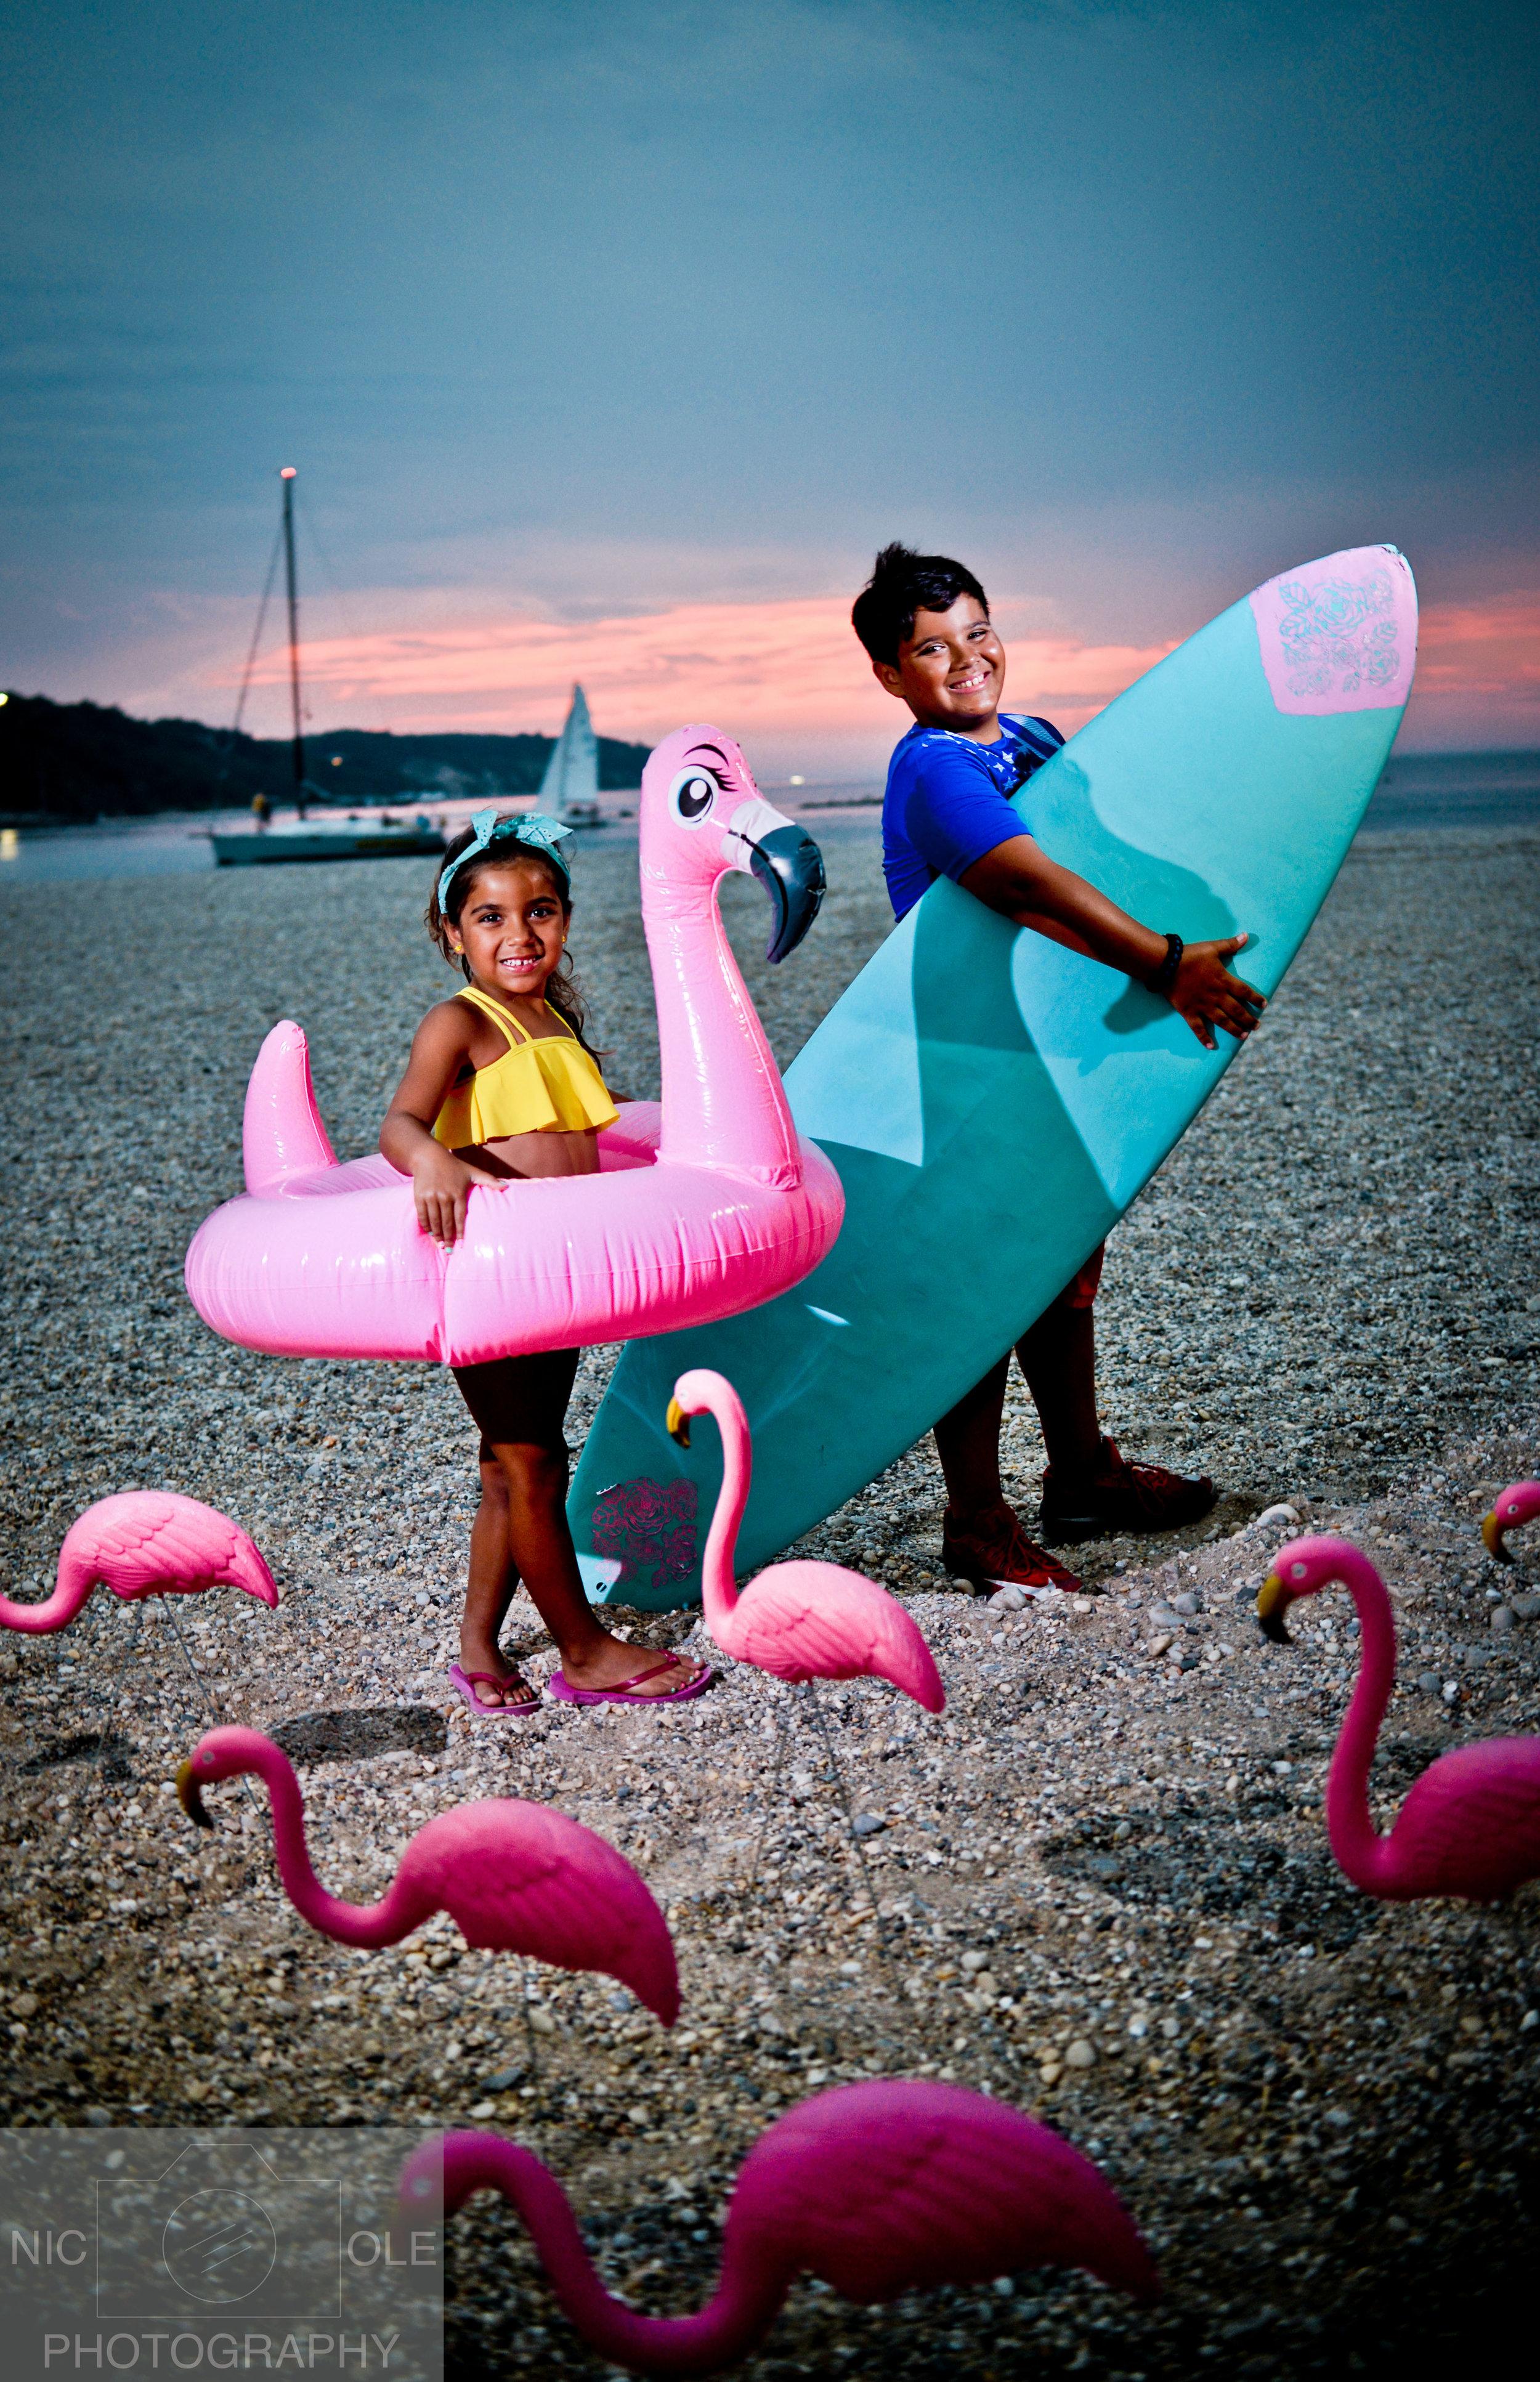 Cielo Noemi Flamingo Beach 7.20.17- NIC-OLE Photography-15.jpg